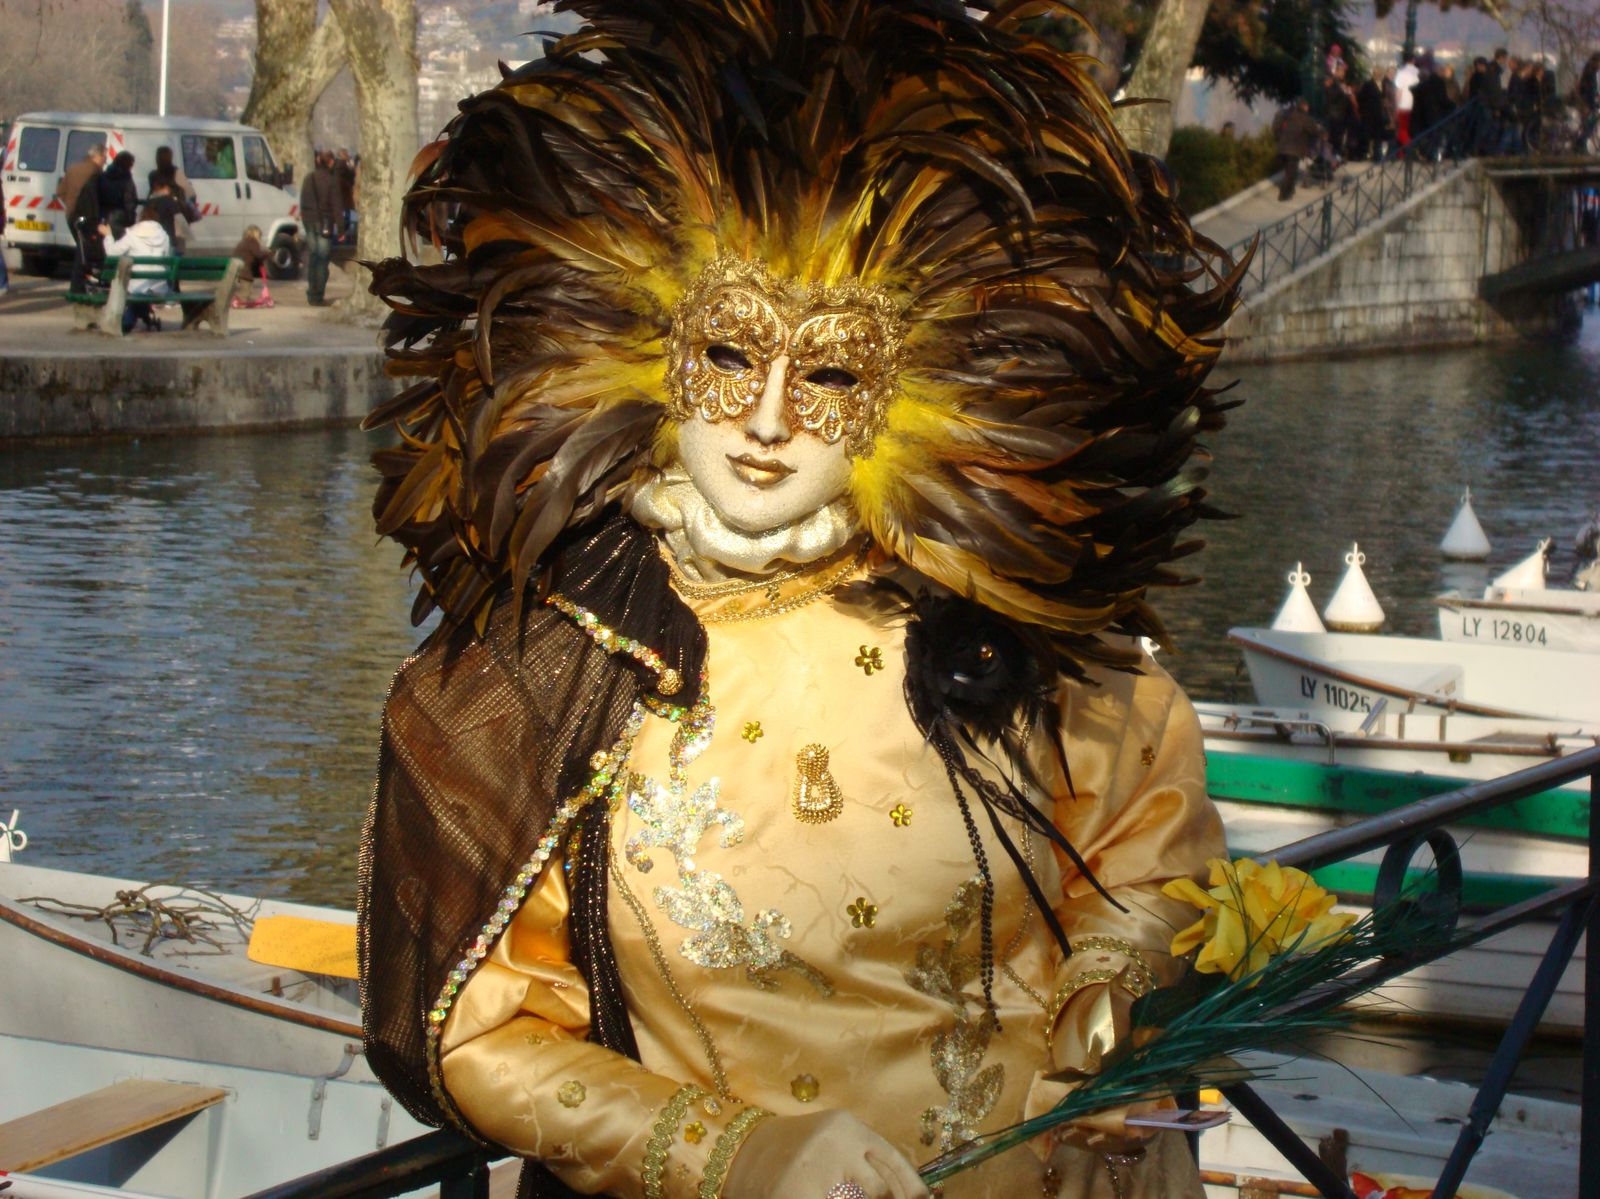 Album - Carnaval d'Annecy